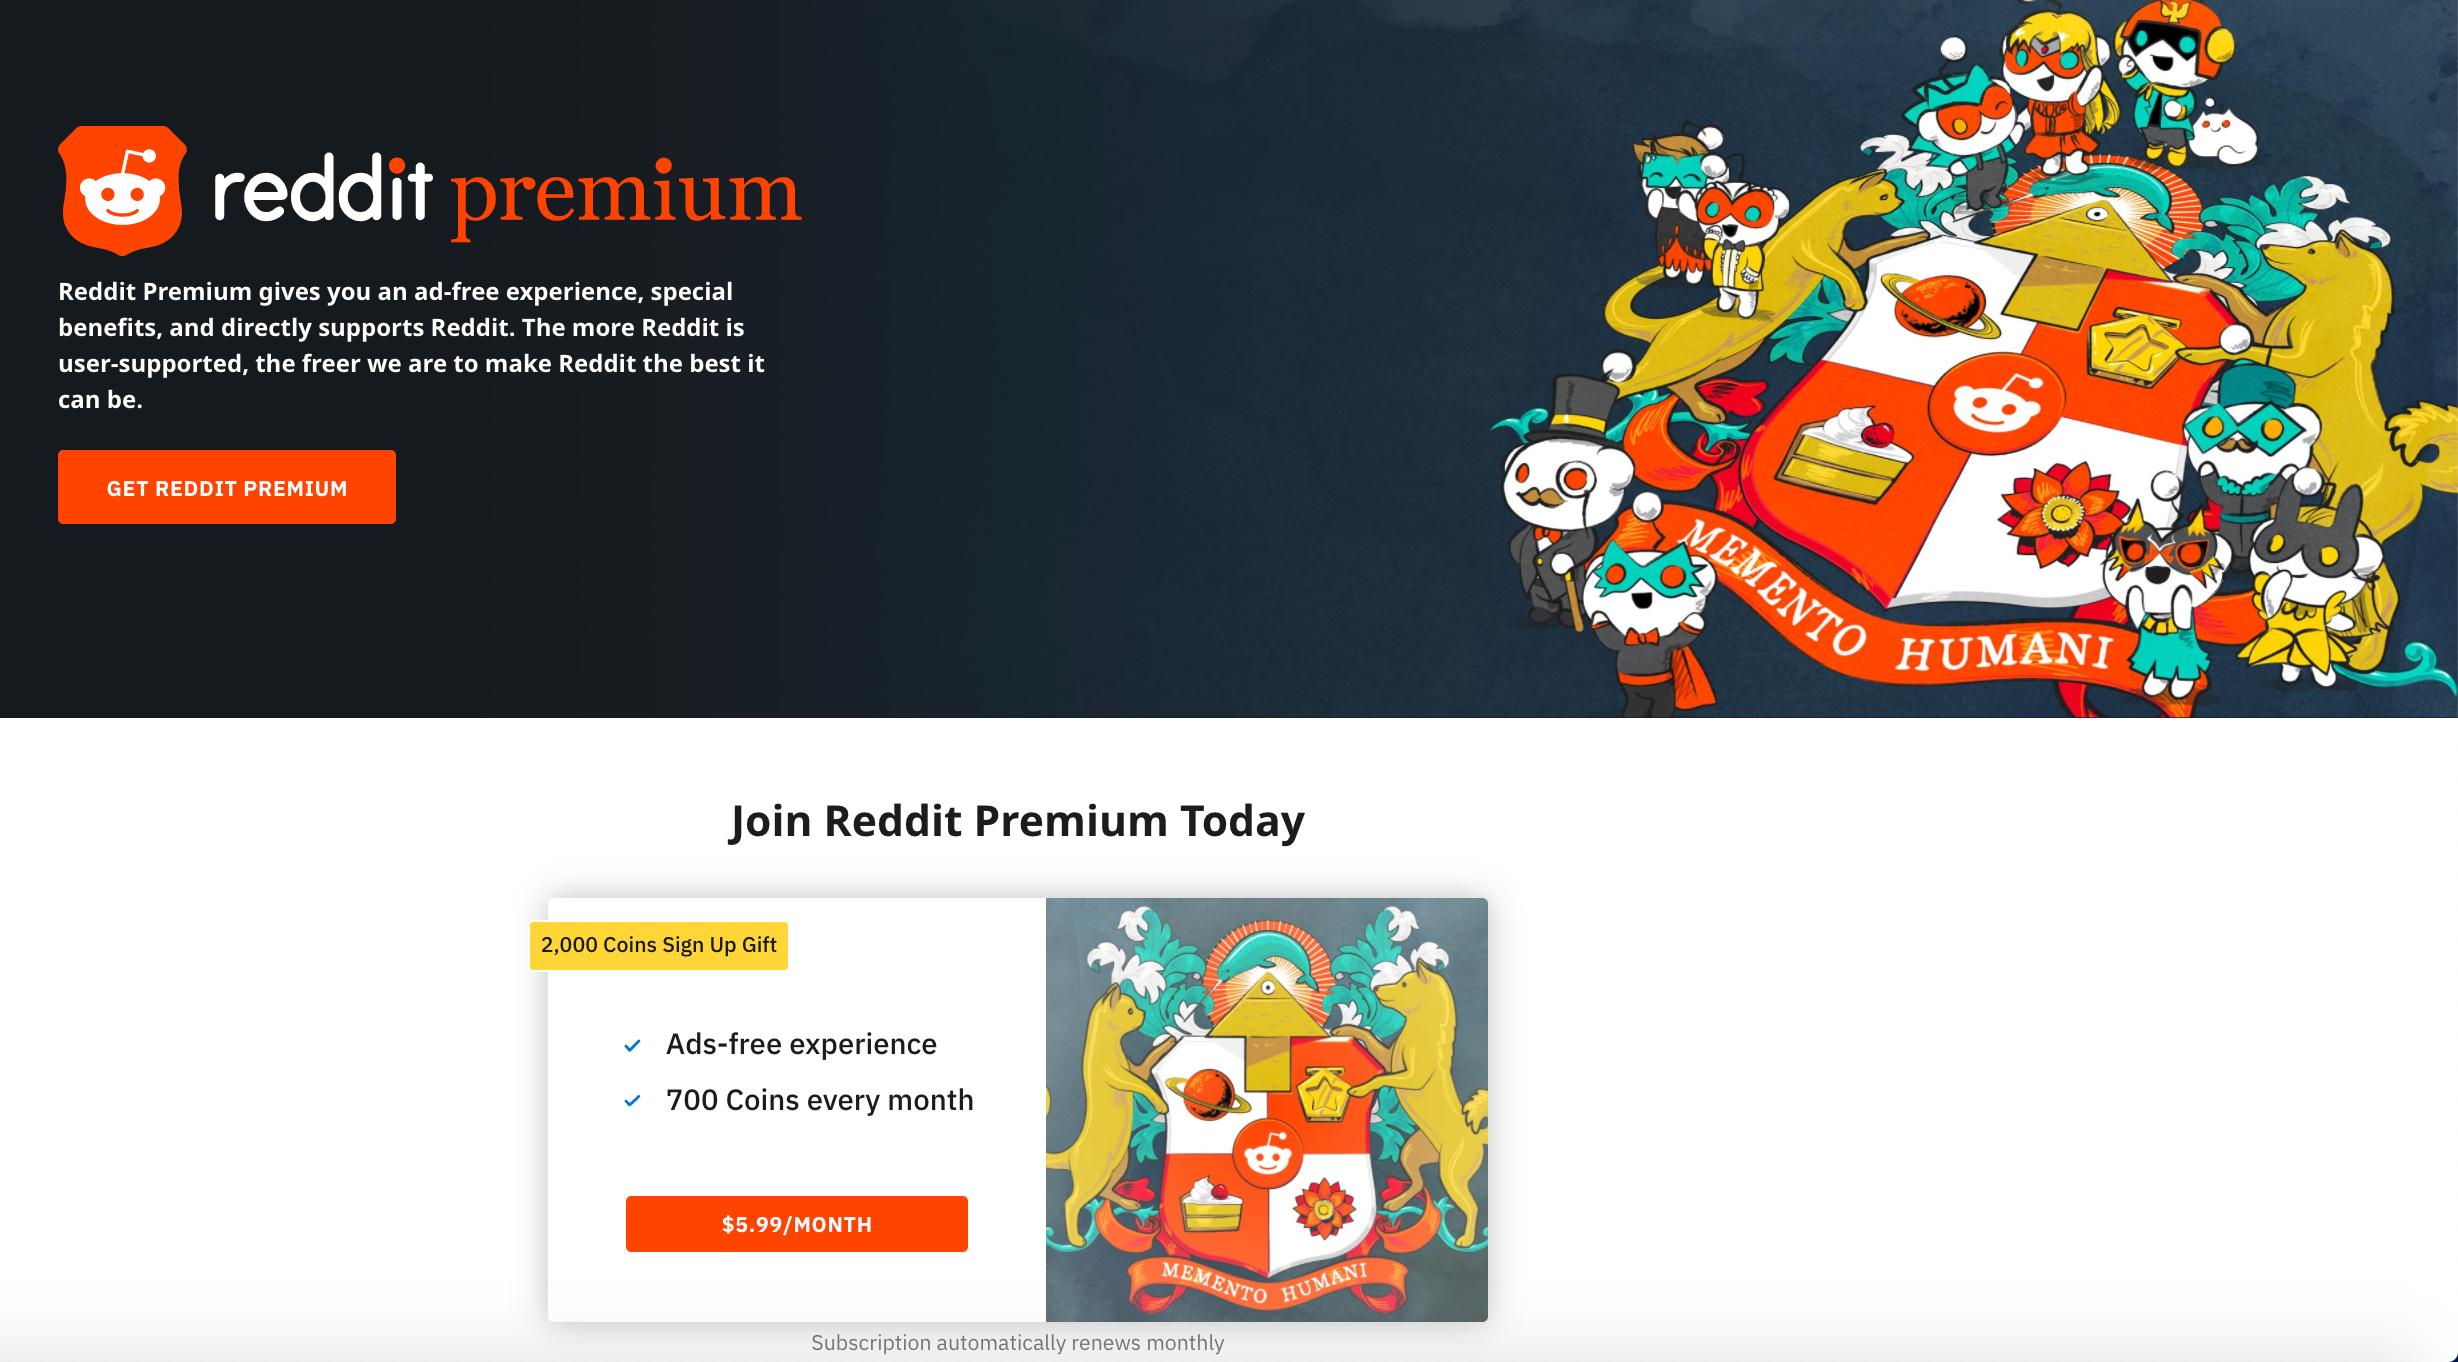 Content Marketing Campaign Tools - Reddit